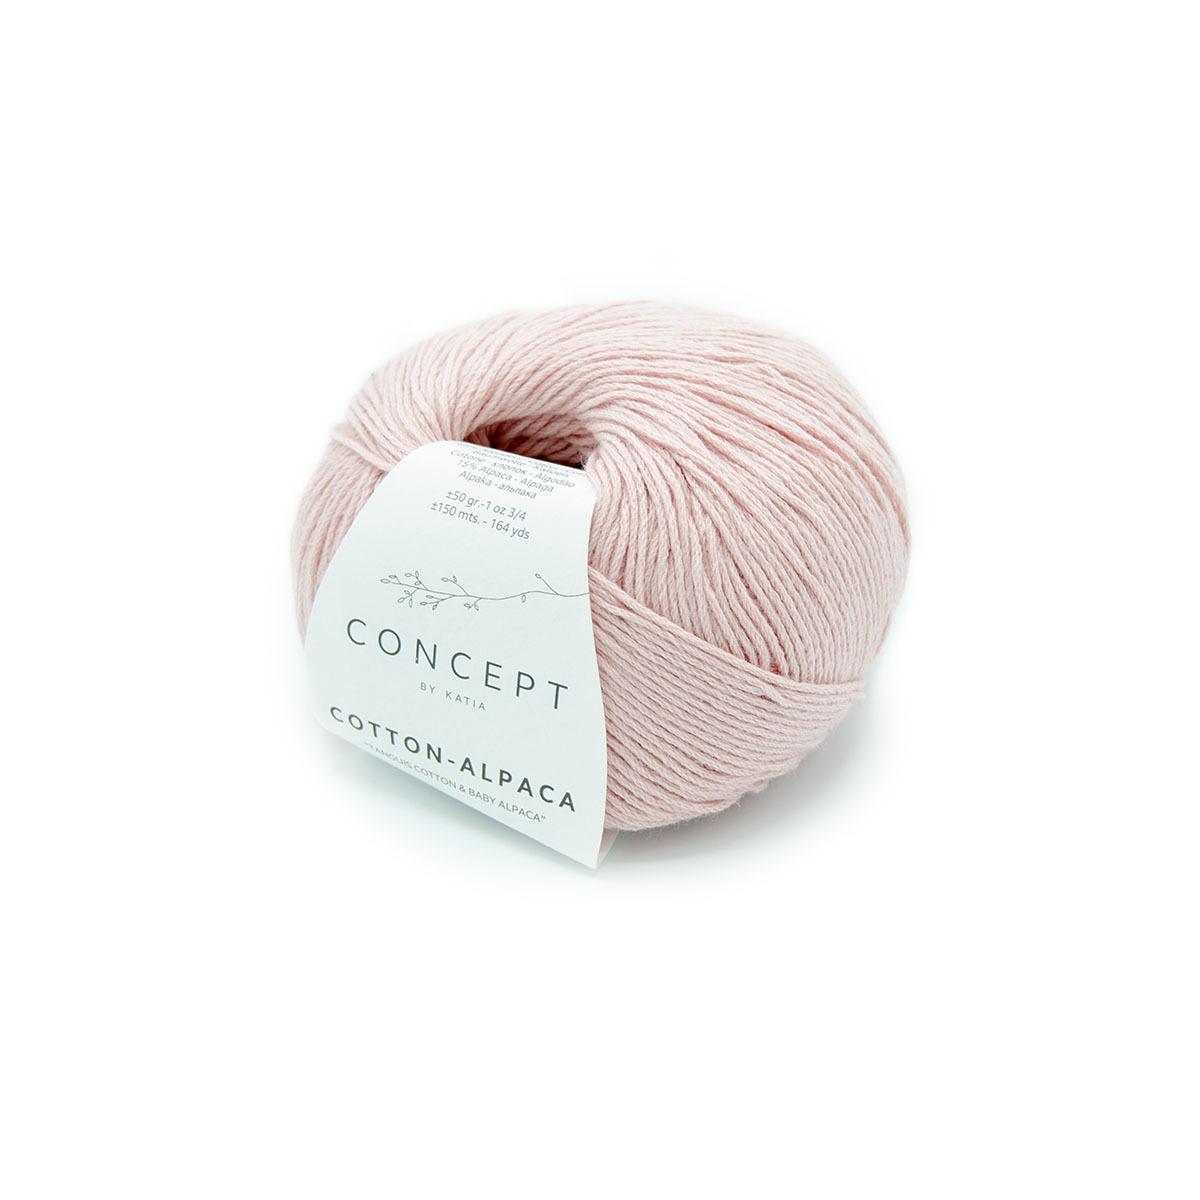 Katia Concept Cotton-Alpaca - 90